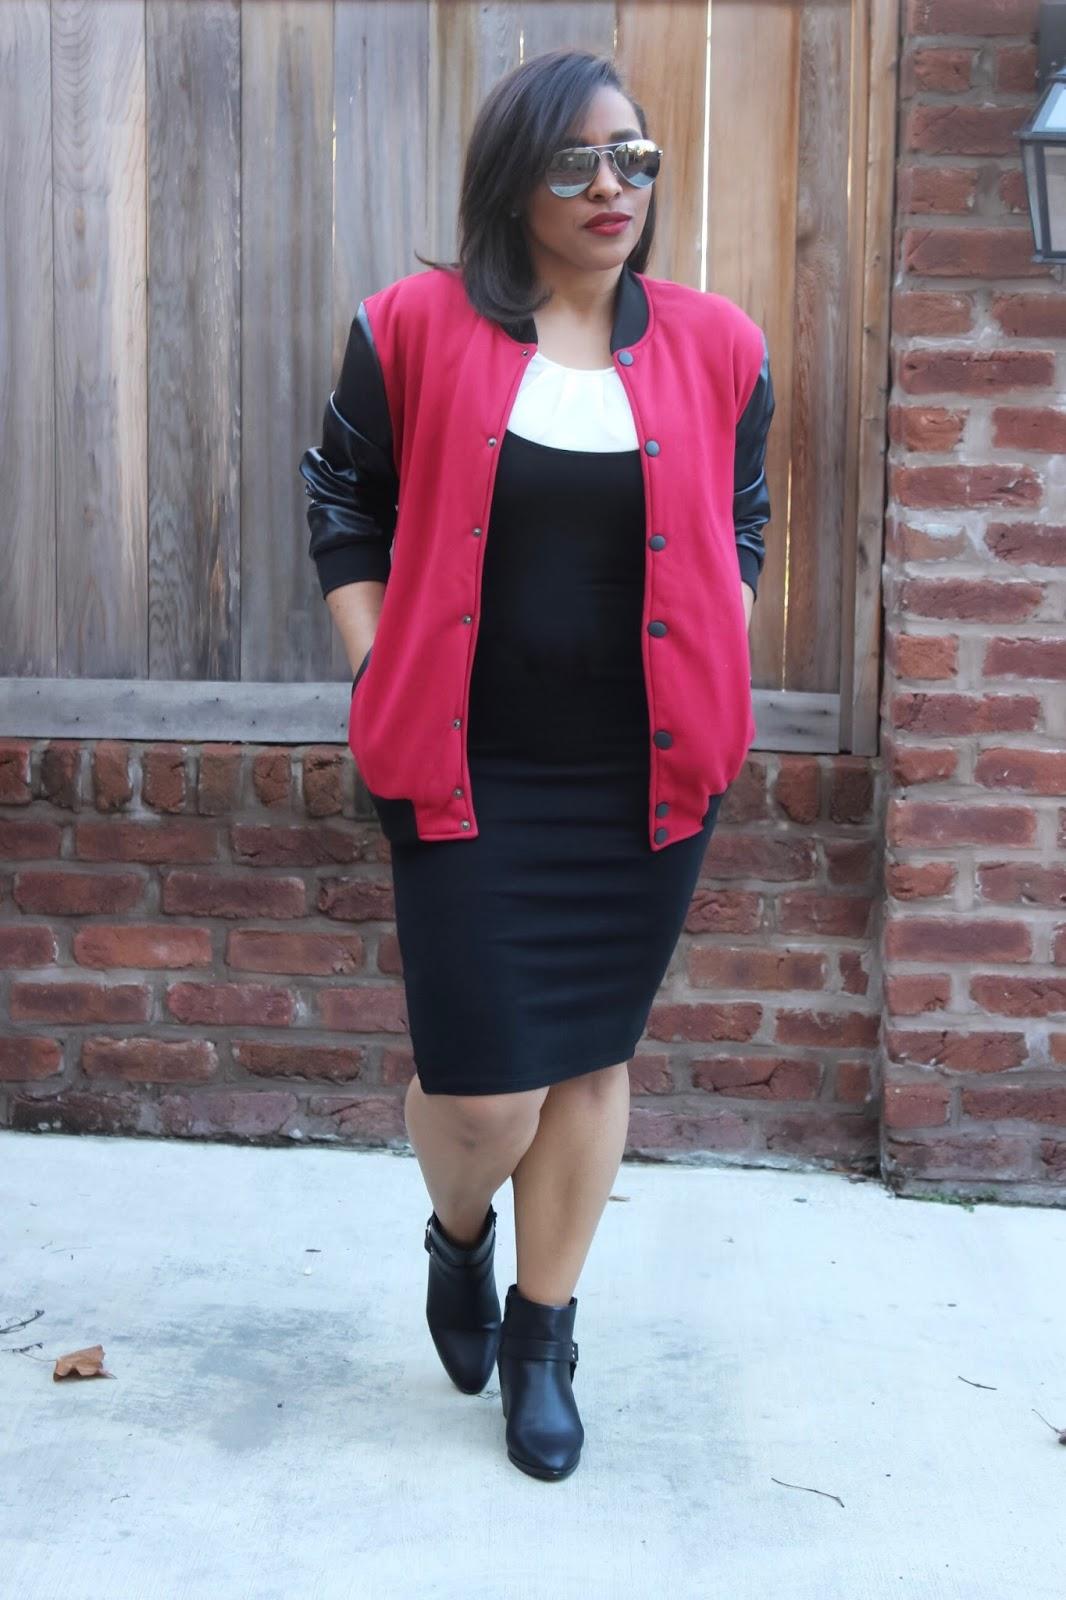 menswear, bomber jacket, mixing feminine and masculine, mixing wardrobe pieces